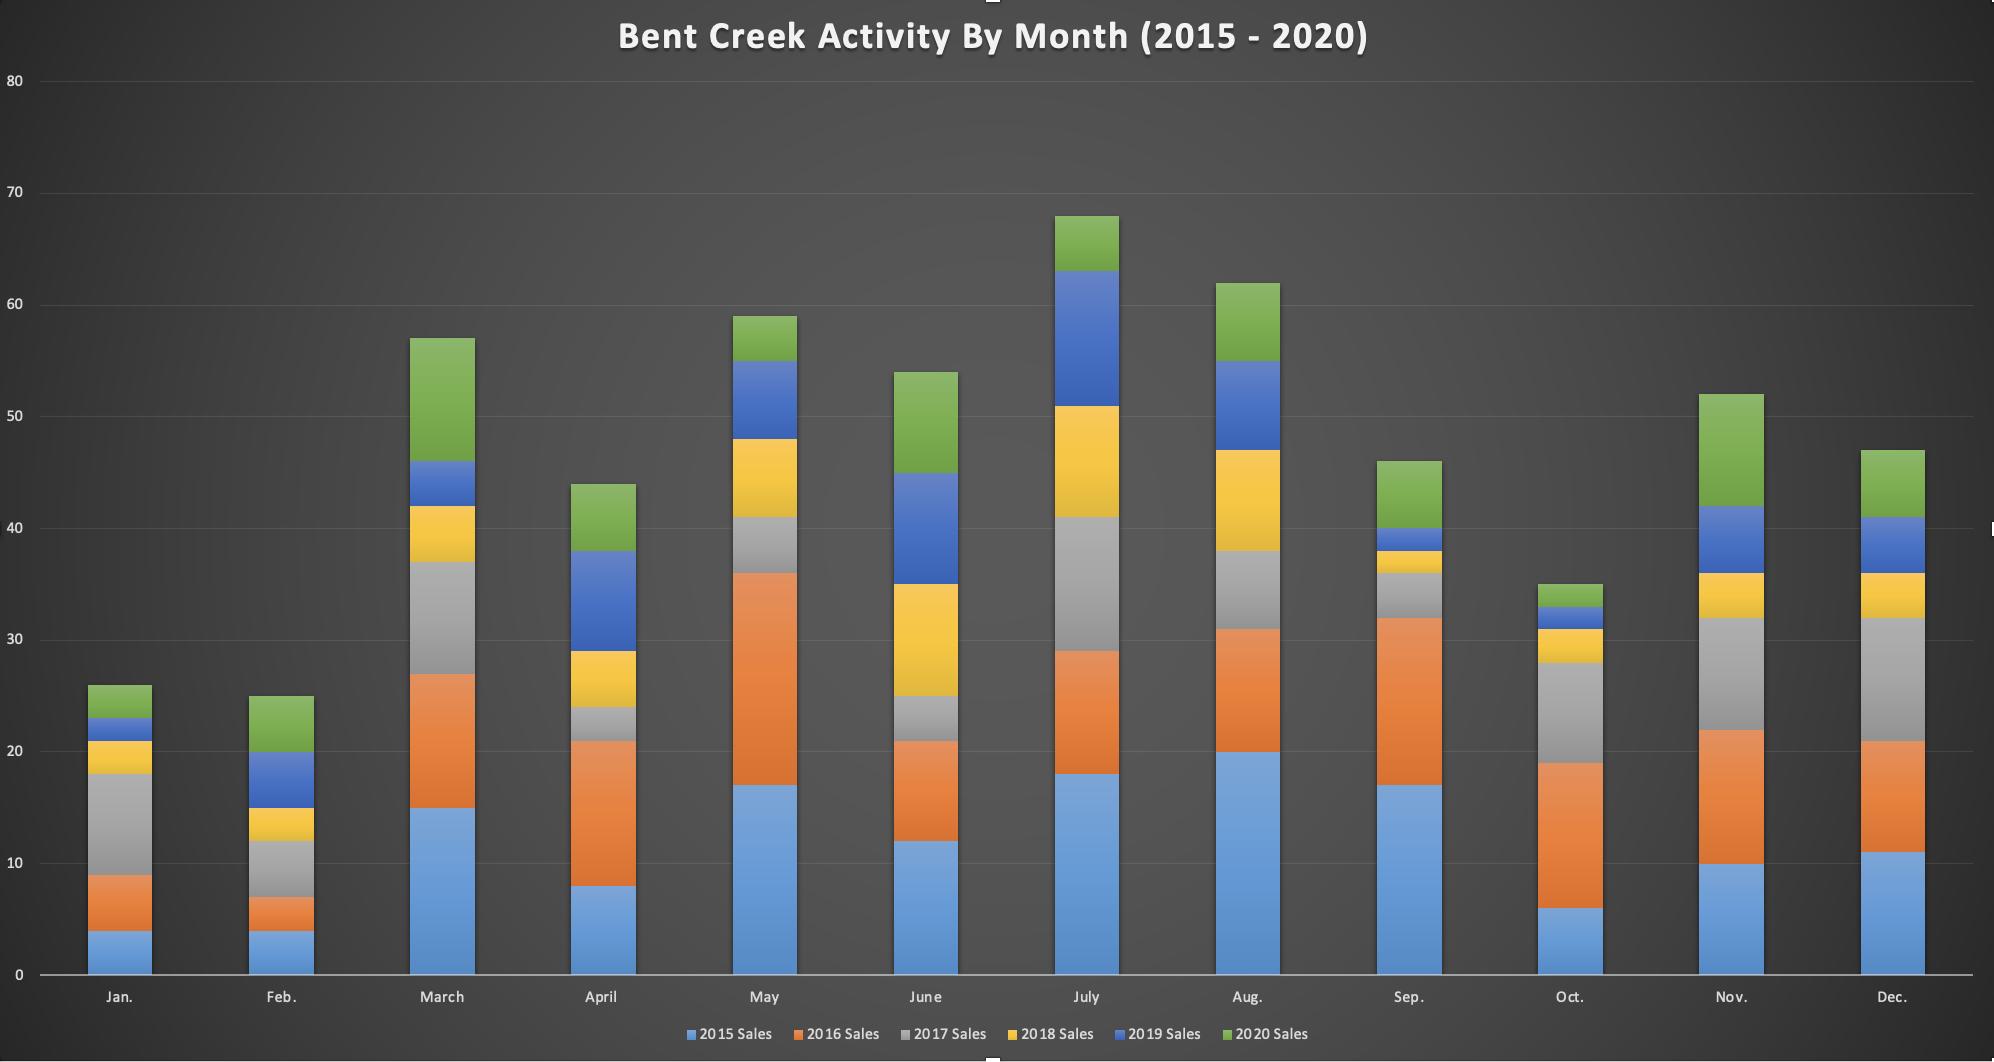 Bent Creek Activity By Month - Through Dec 2020